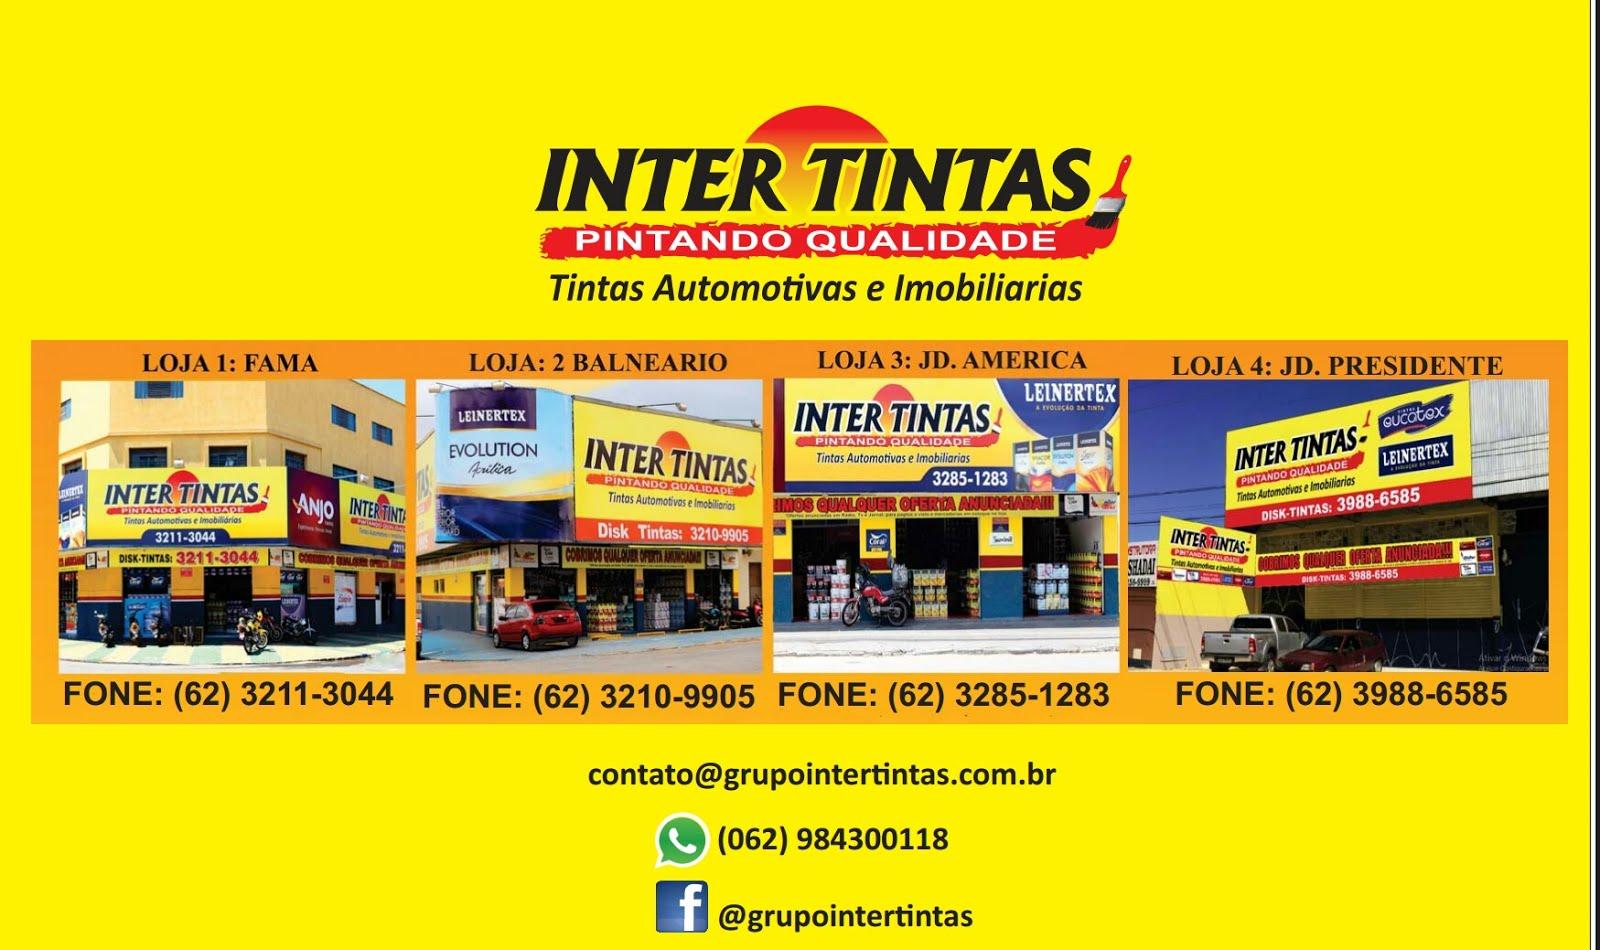 Inter Tintas